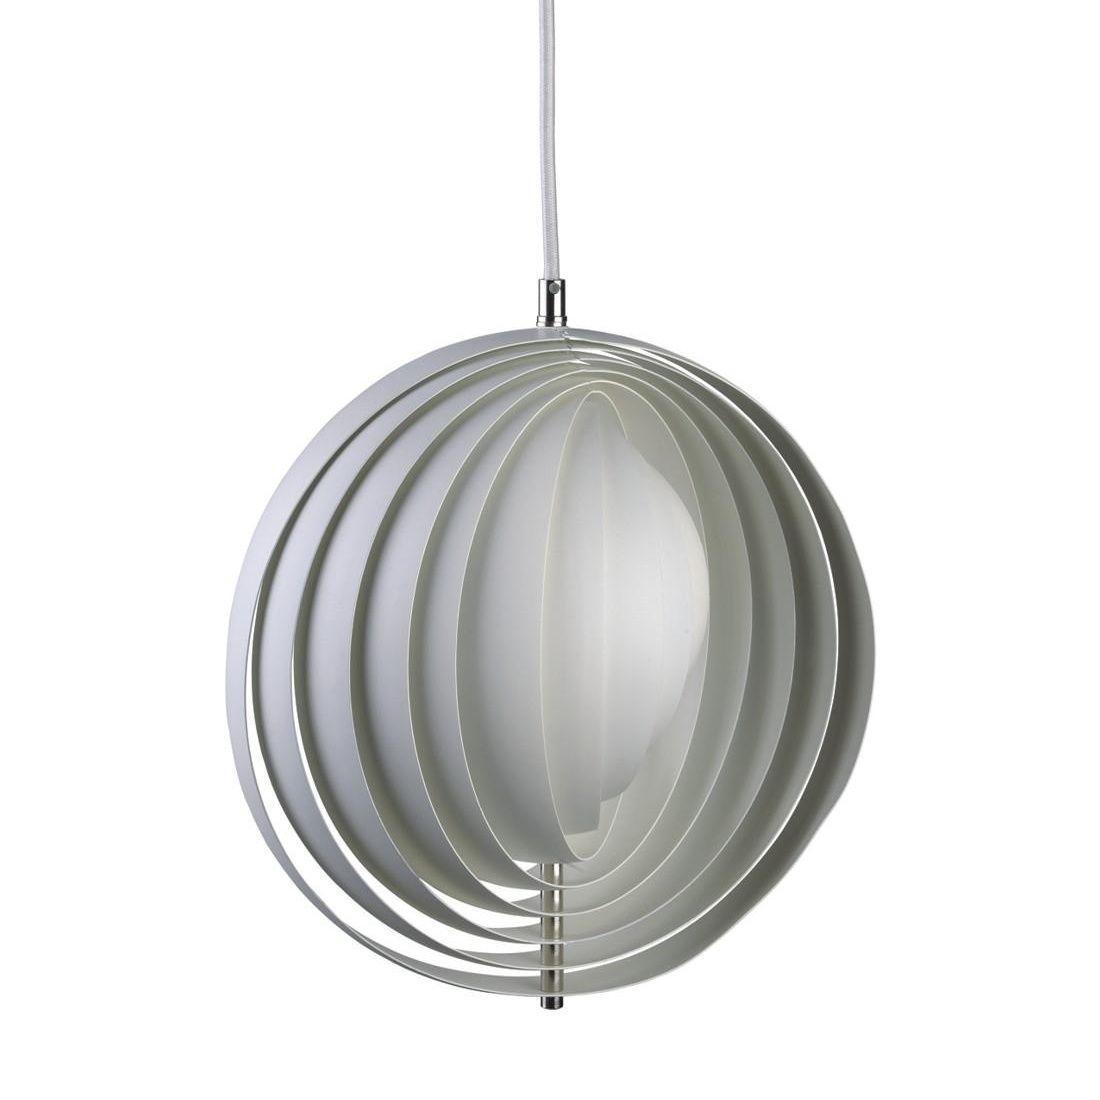 Moon lamp suspension lamp verpan for Suspension a 3 lampes